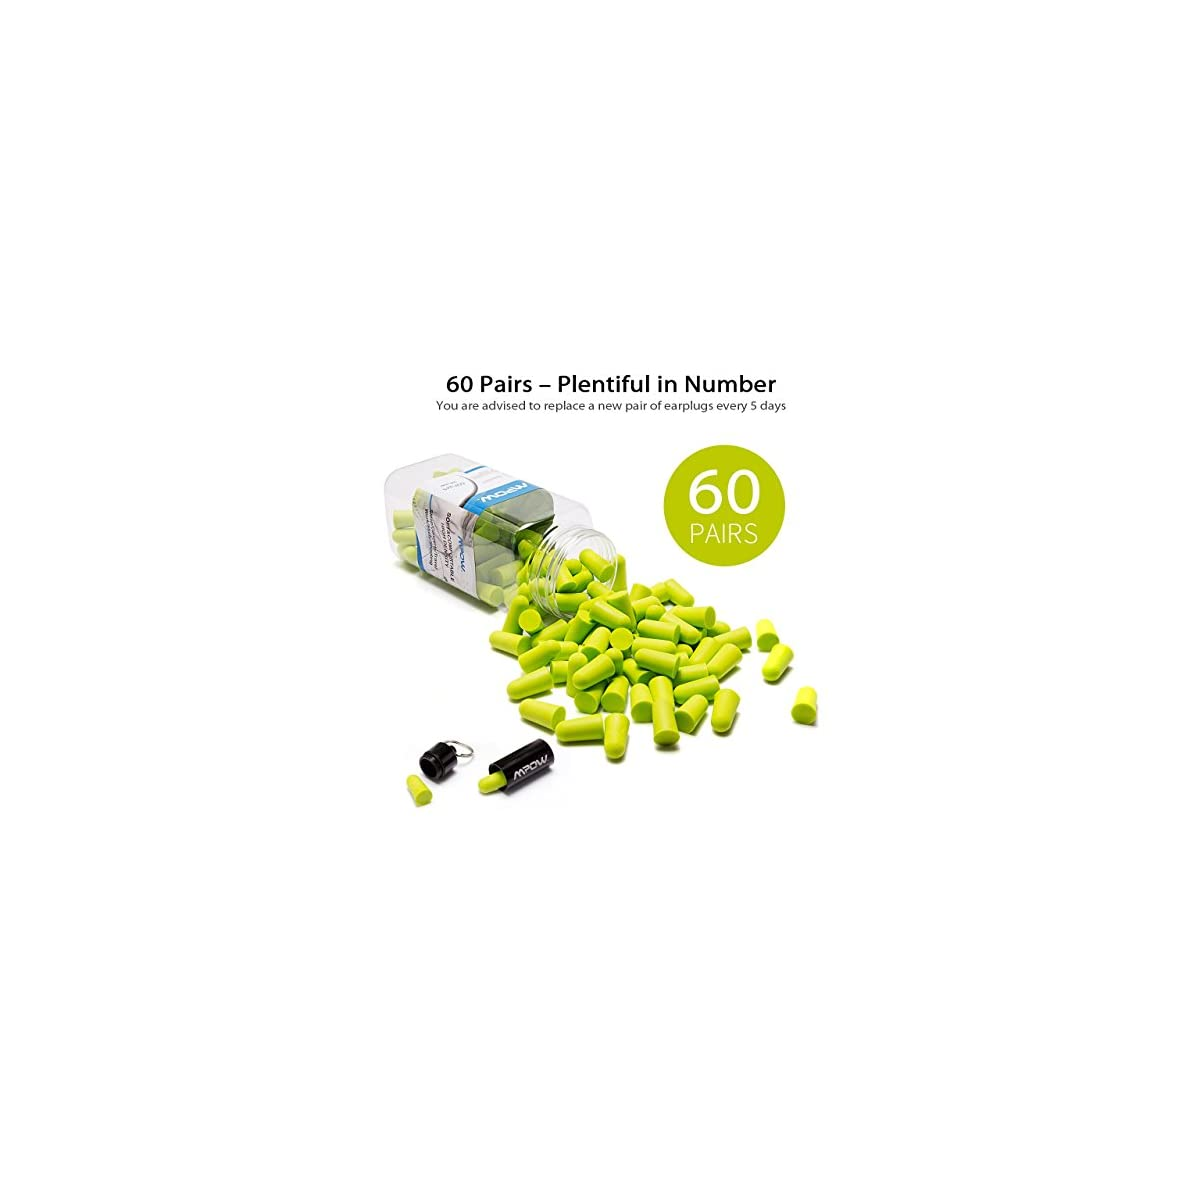 Soft PU Foam Noise Cancelling Earplug 10 Pairs Earplugs for Sleeping Memory Foam Ear Buds Lightweight with Free Carry Case for Men